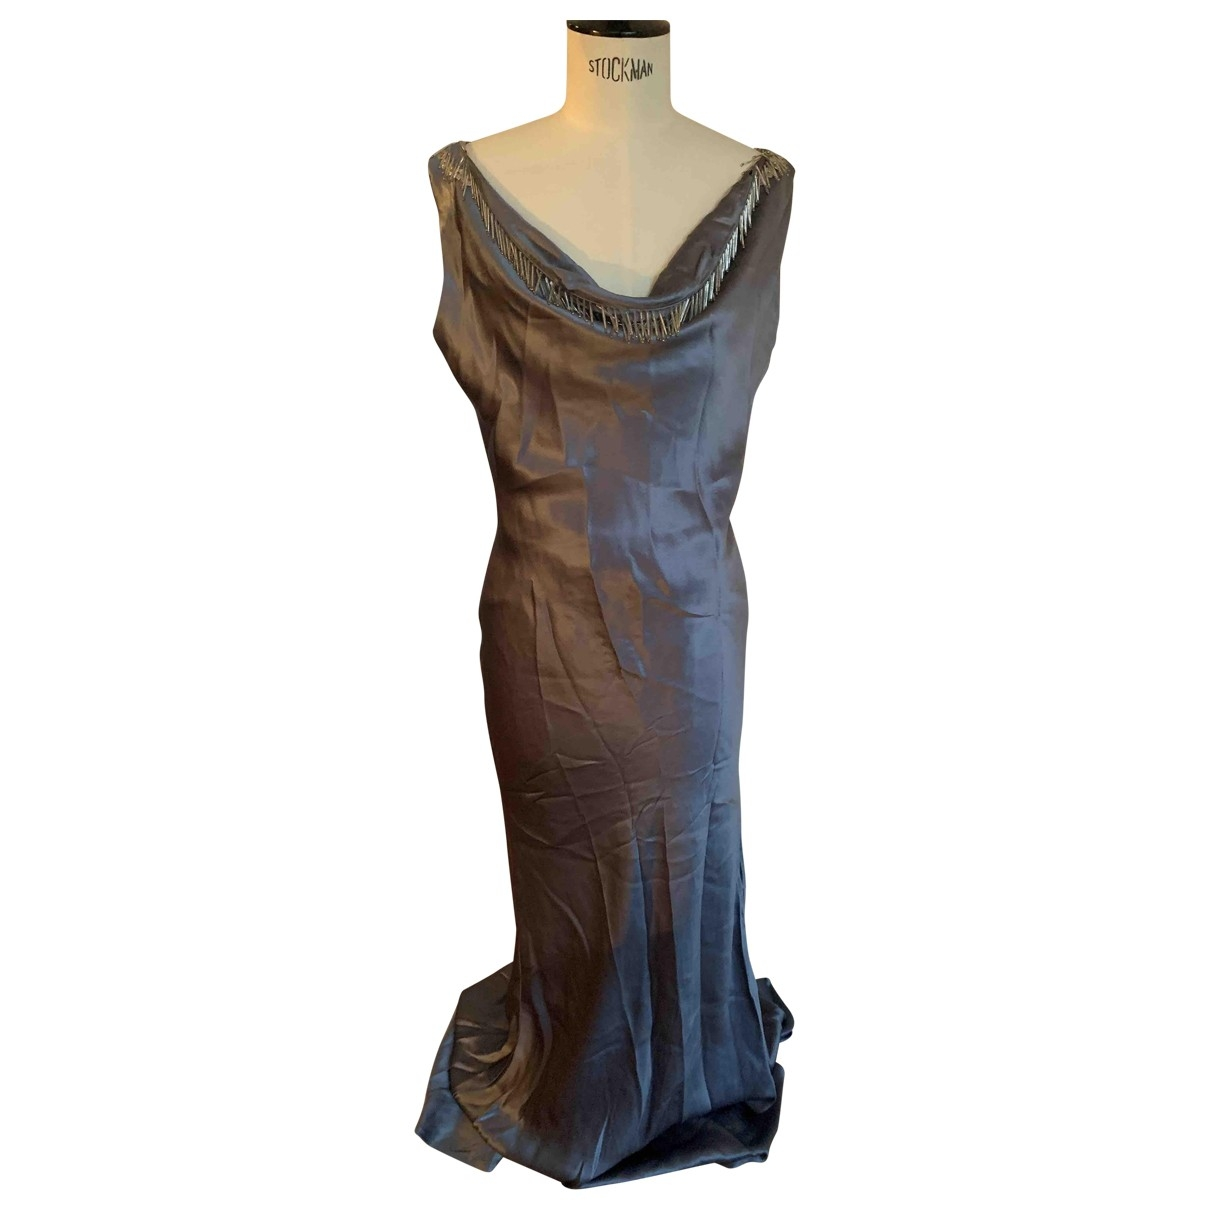 Alexander Mcqueen - Robe   pour femme en soie - anthracite